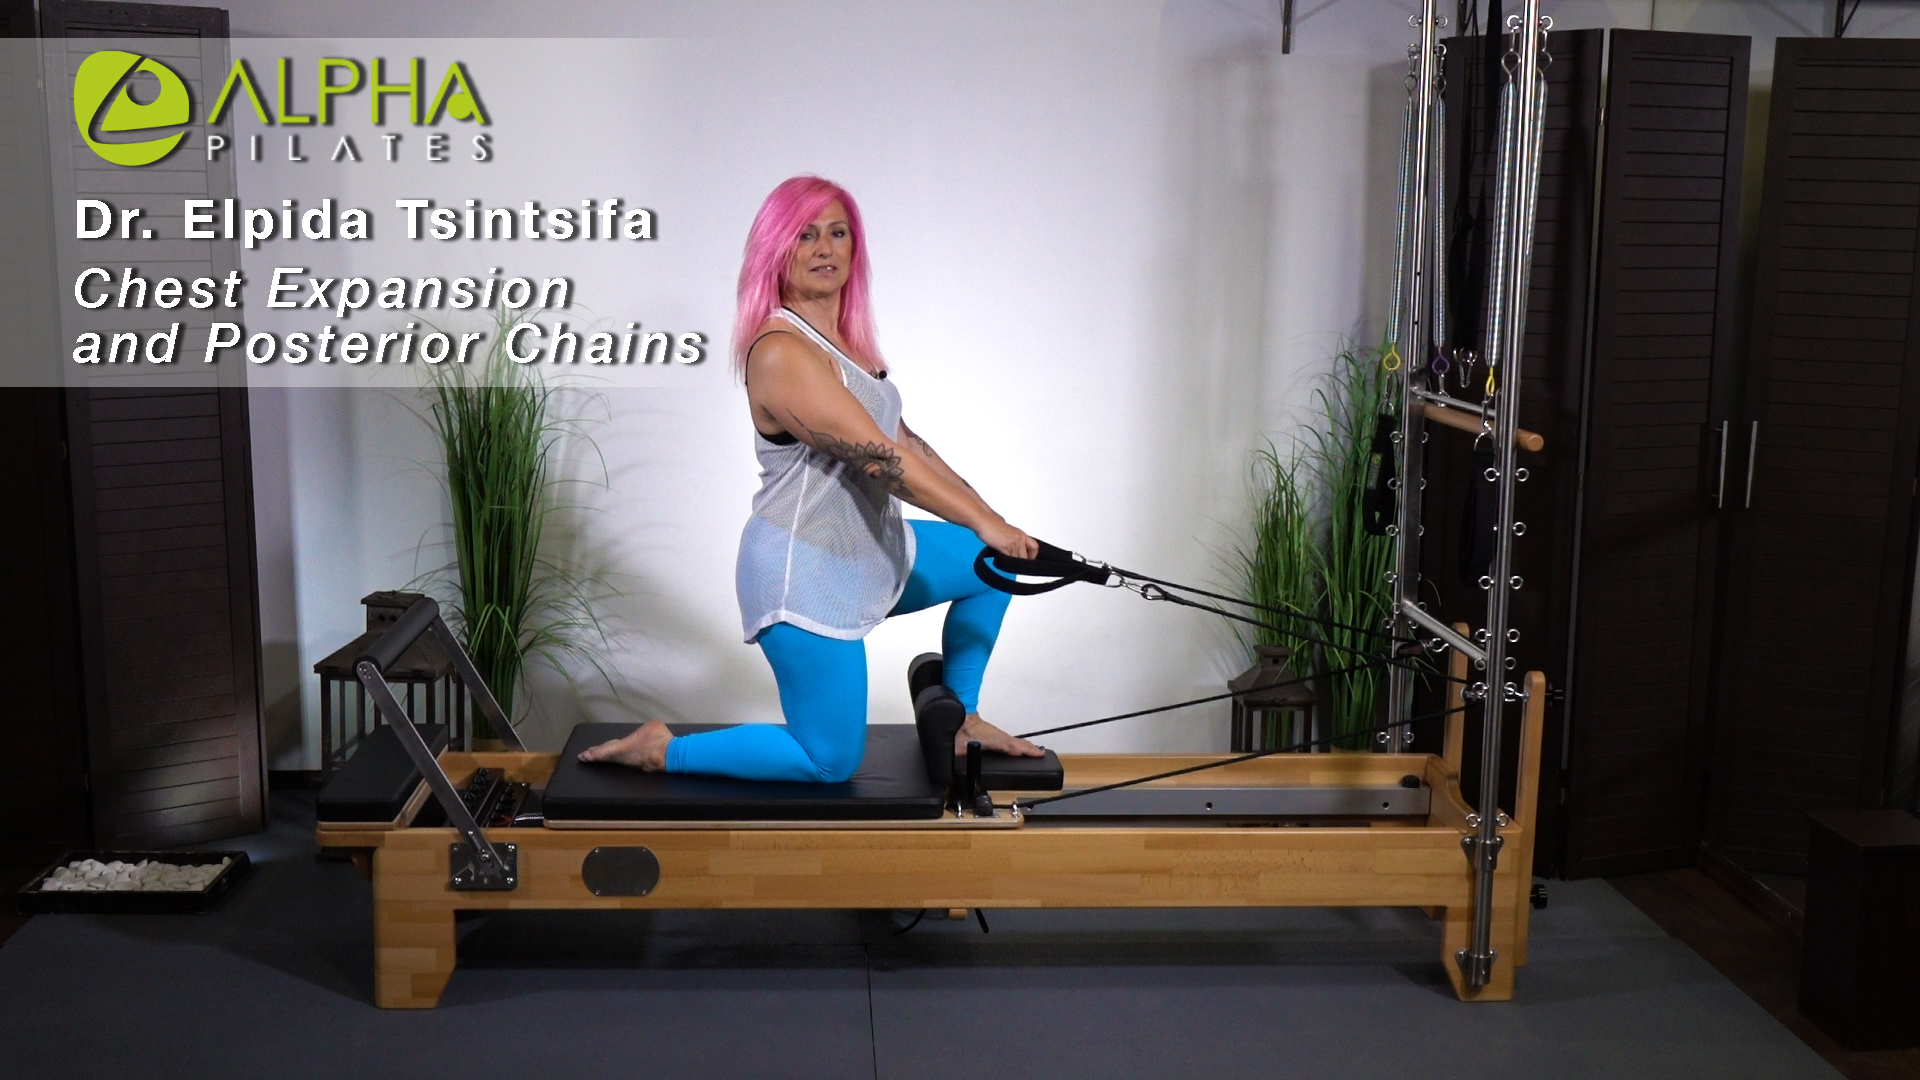 Reformer tips with Elpida Tsintsifa and Alpha PilatesReformer Chest expansion